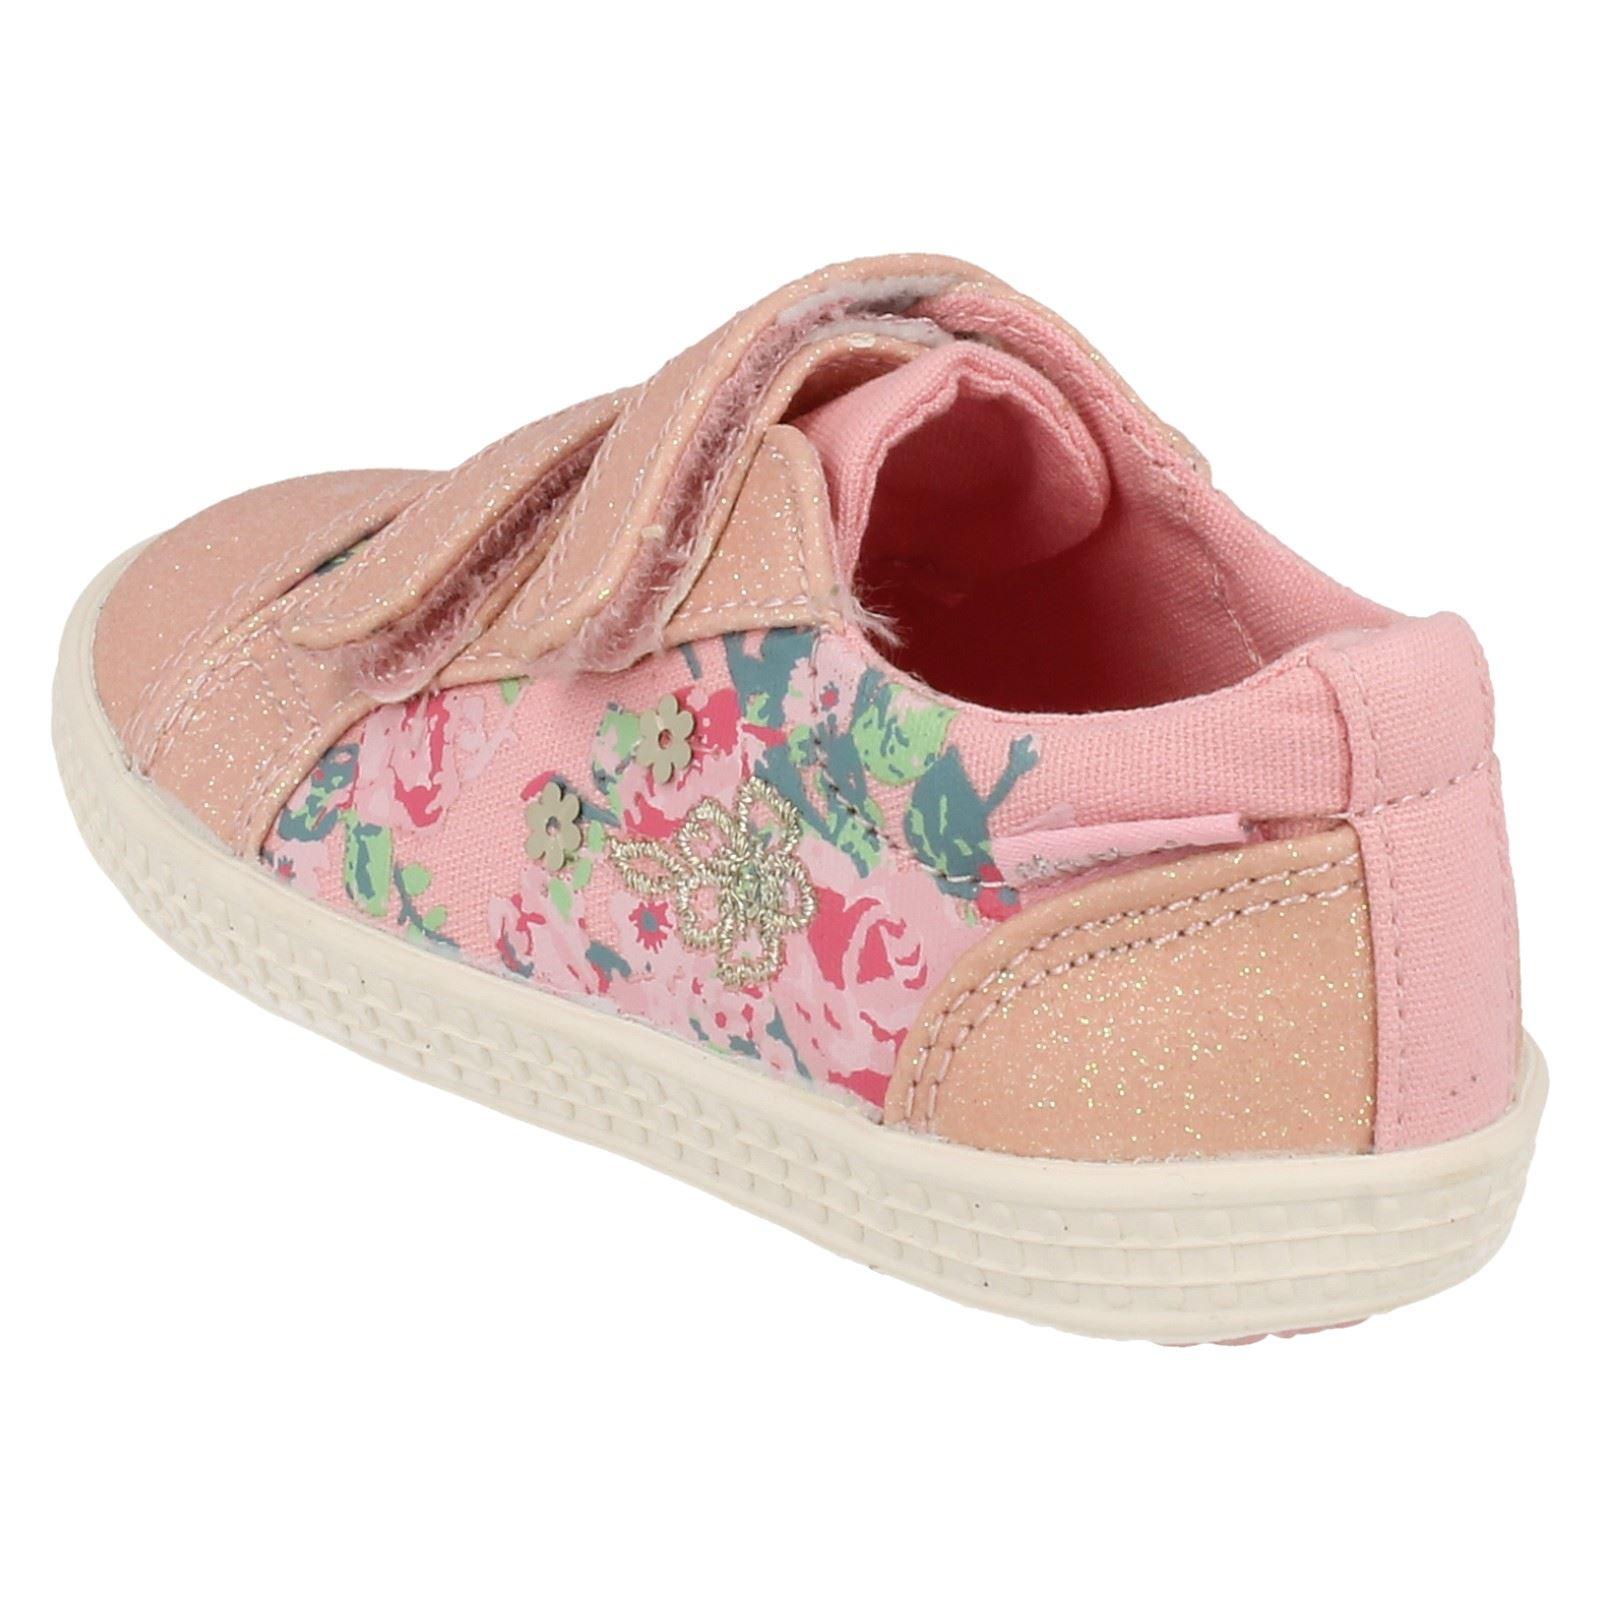 Niñas Startrite Brillante Zapatos De Lona Edith